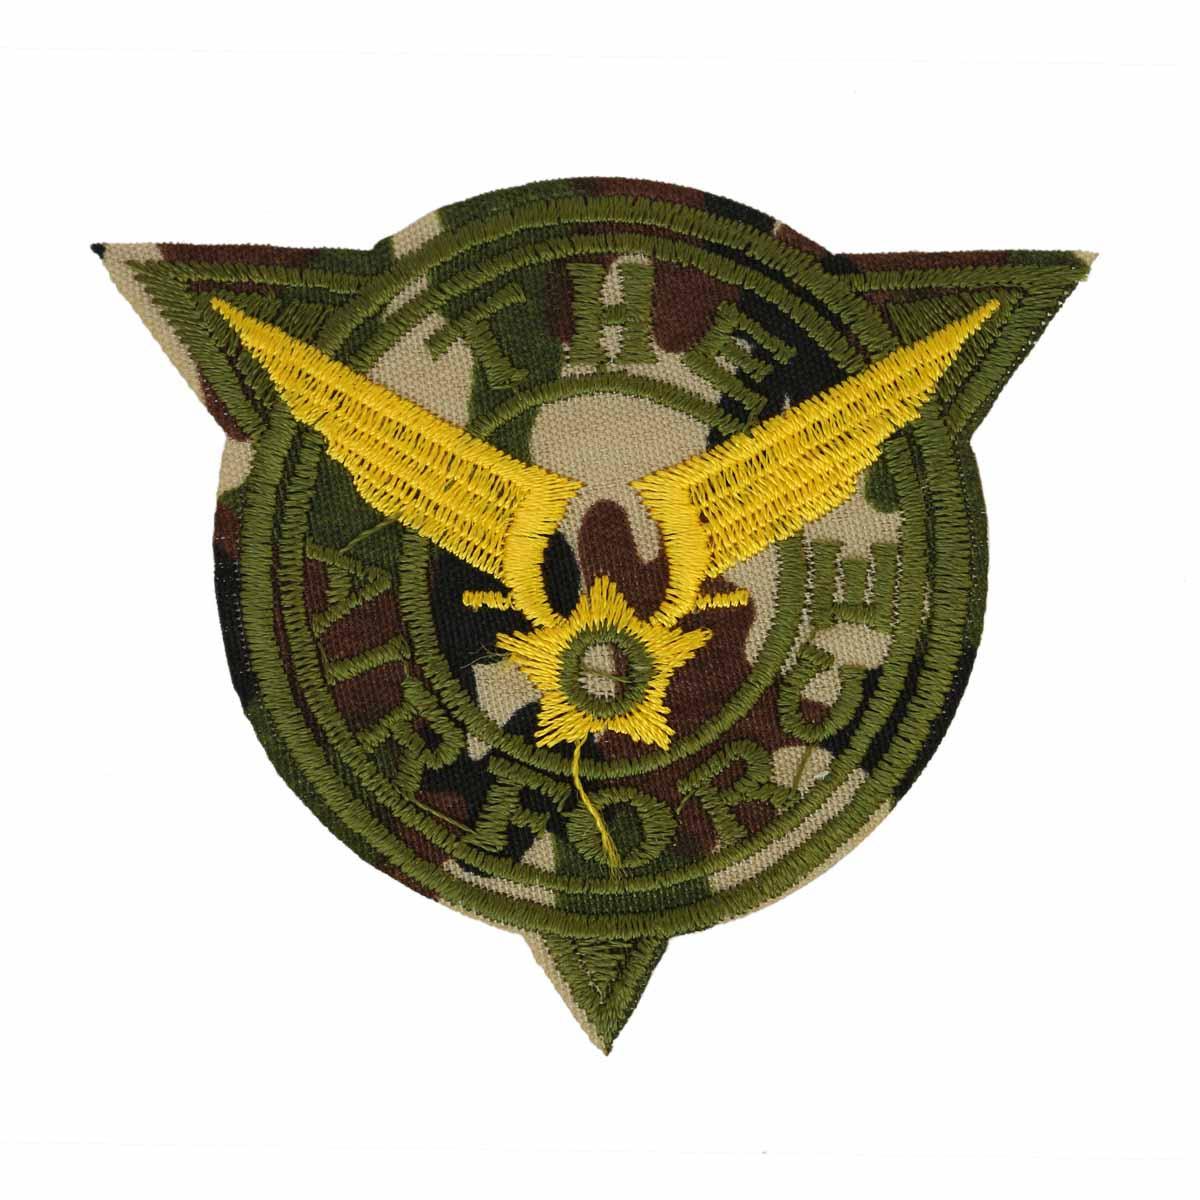 "Термоаппликация LML067 ""Airforce"" 1 шт., Hobby&Pro"